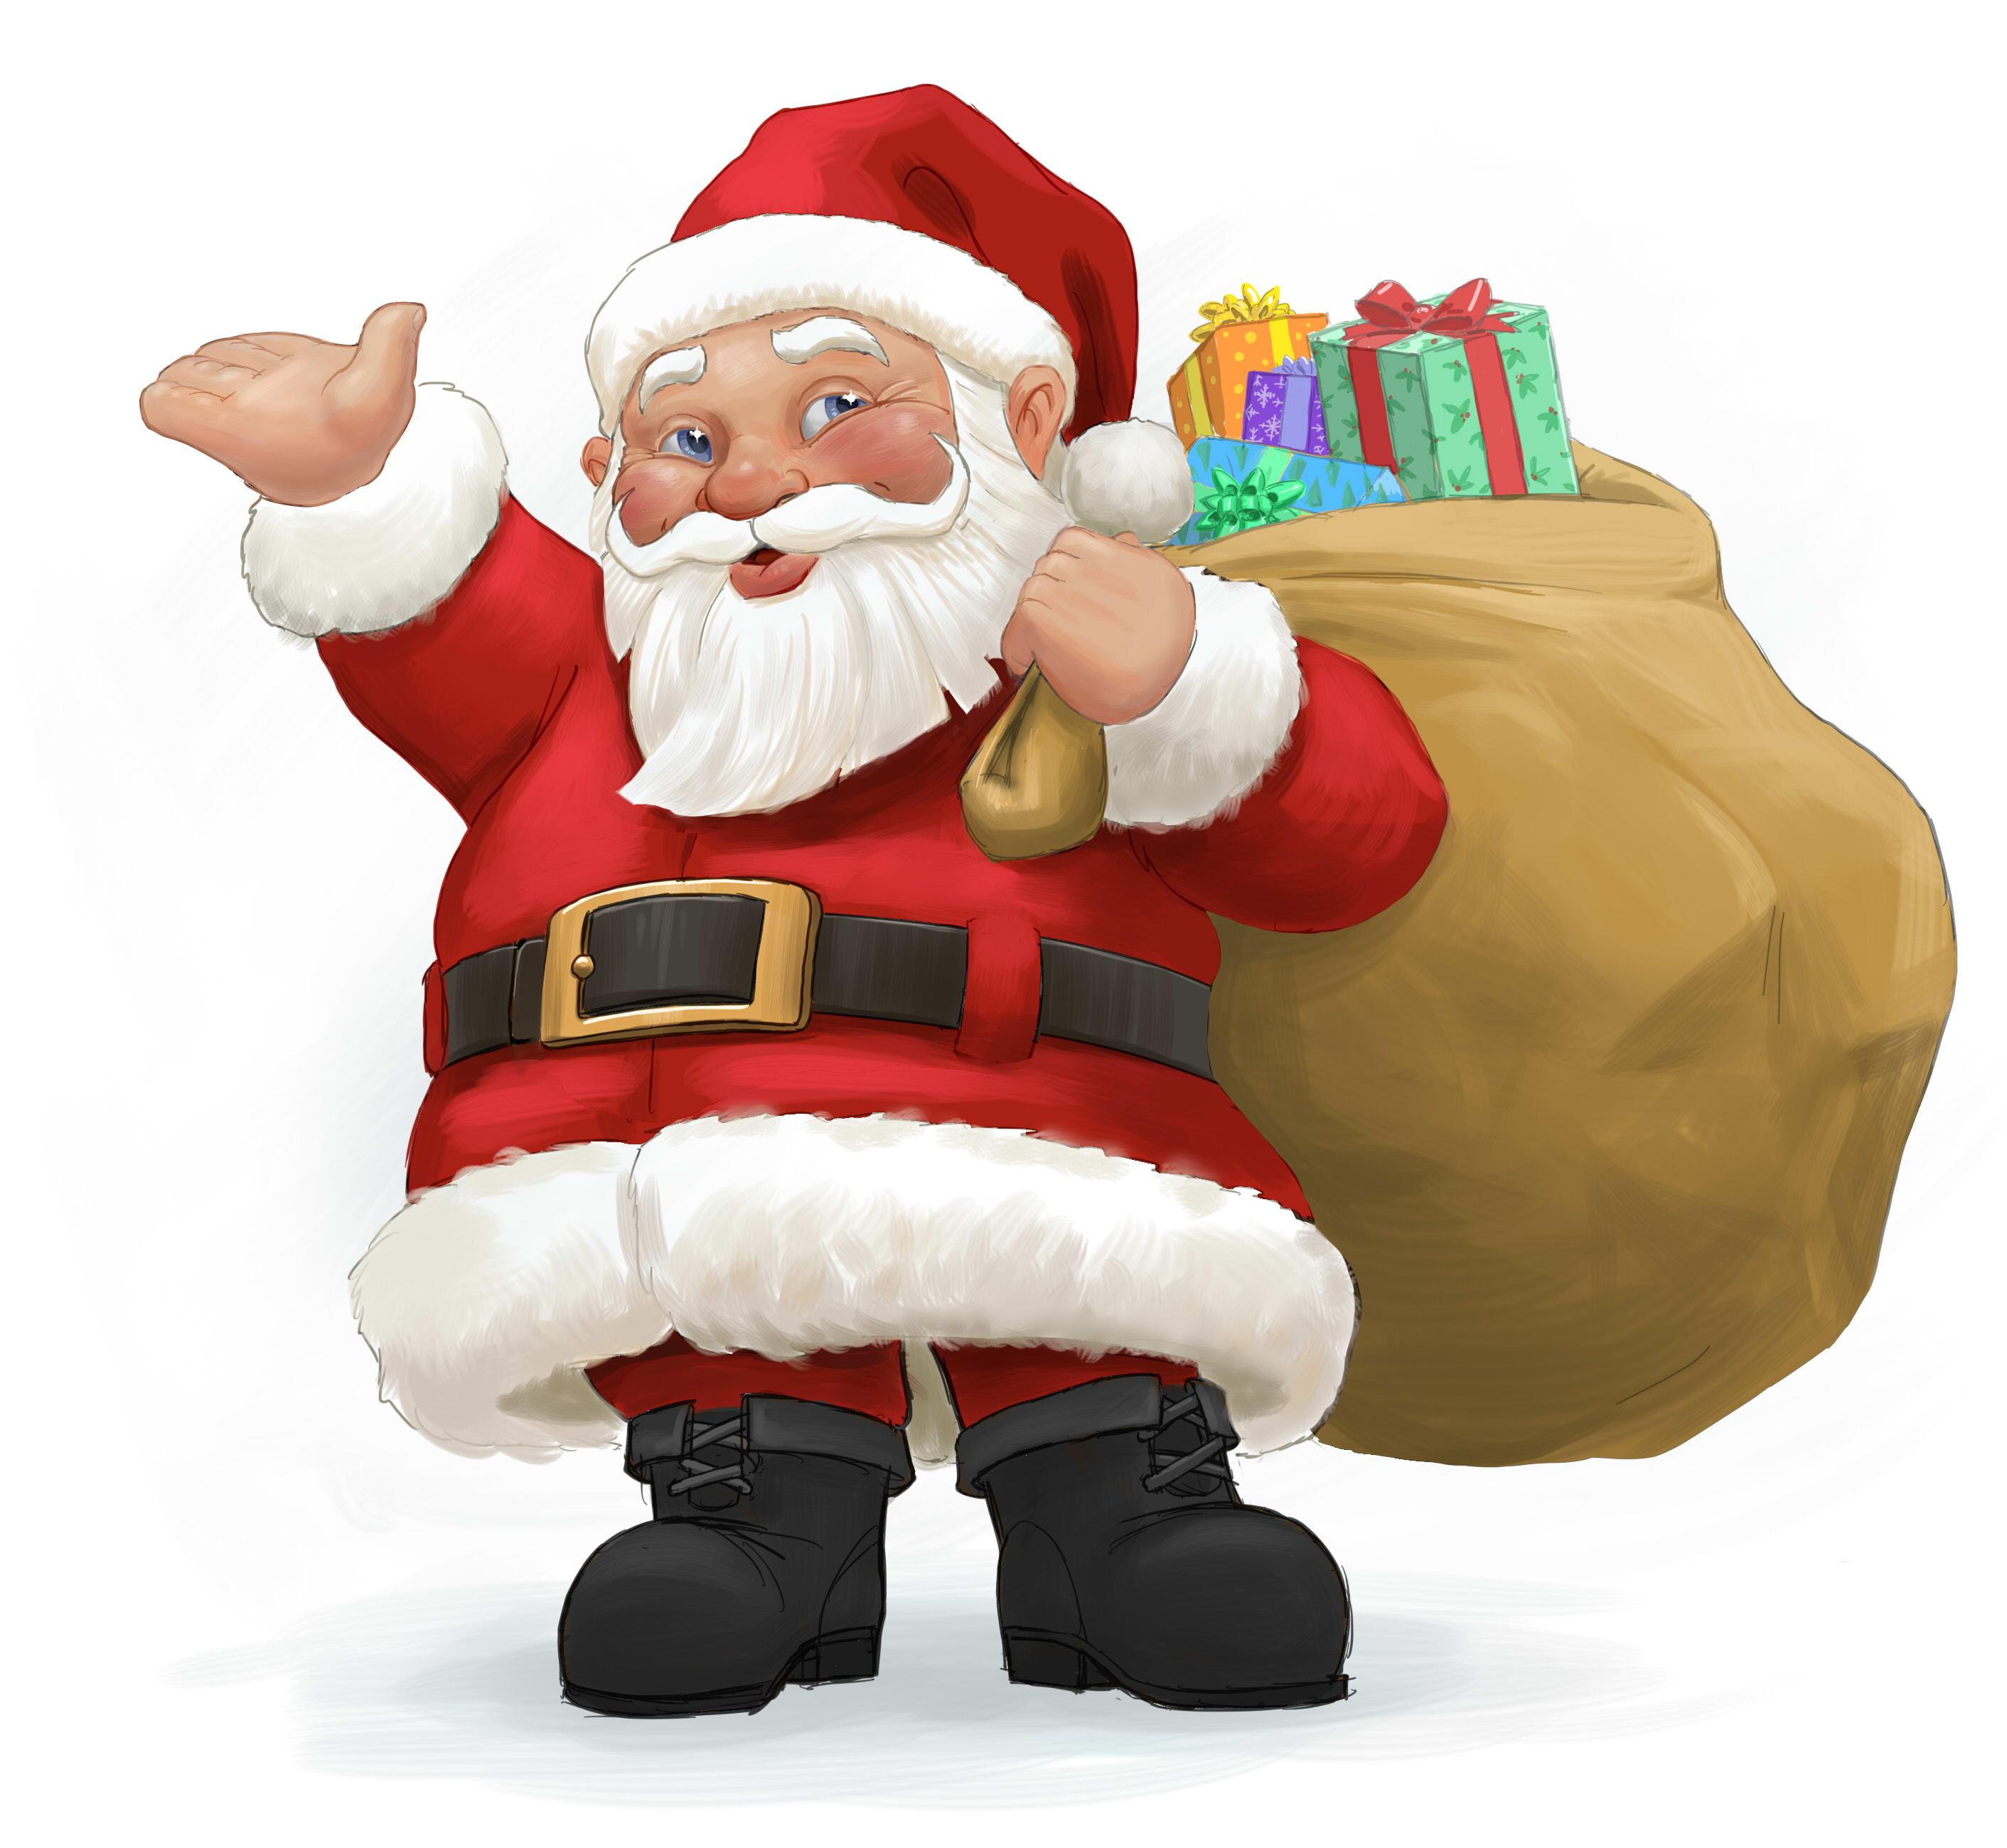 Santa clipart clous #15